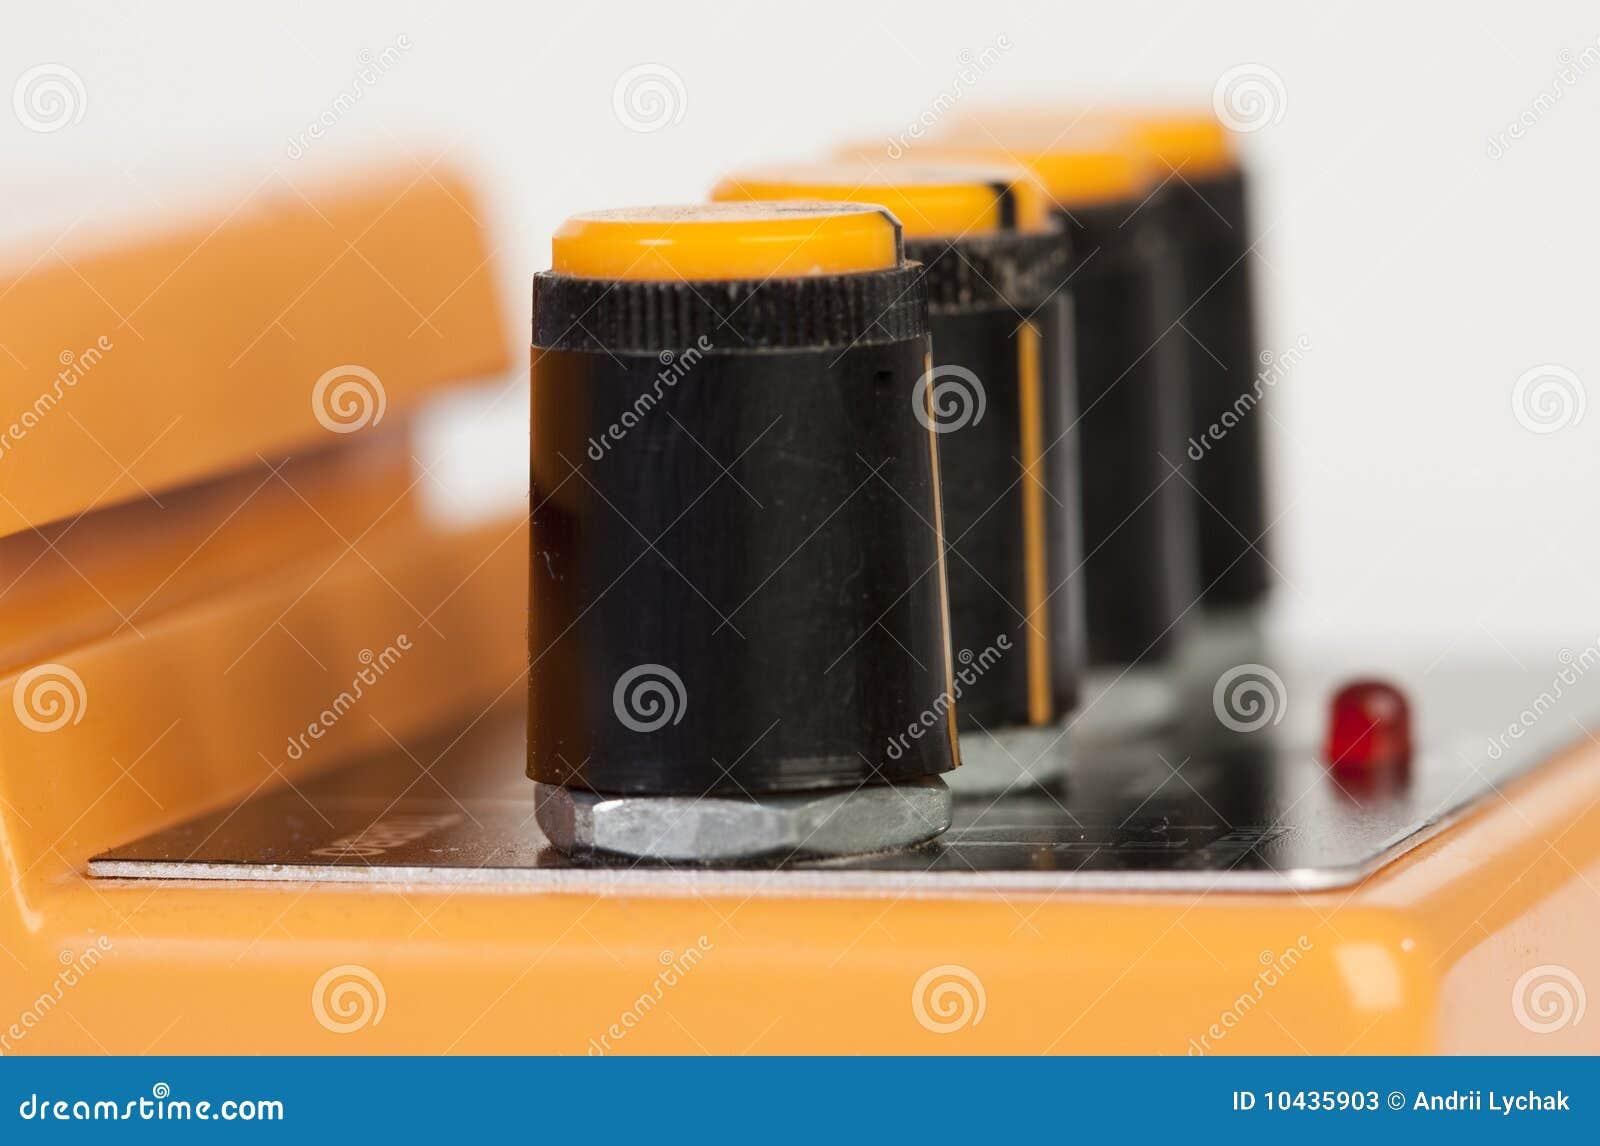 Audio Distortion Device Stock Photos - Image: 10435903